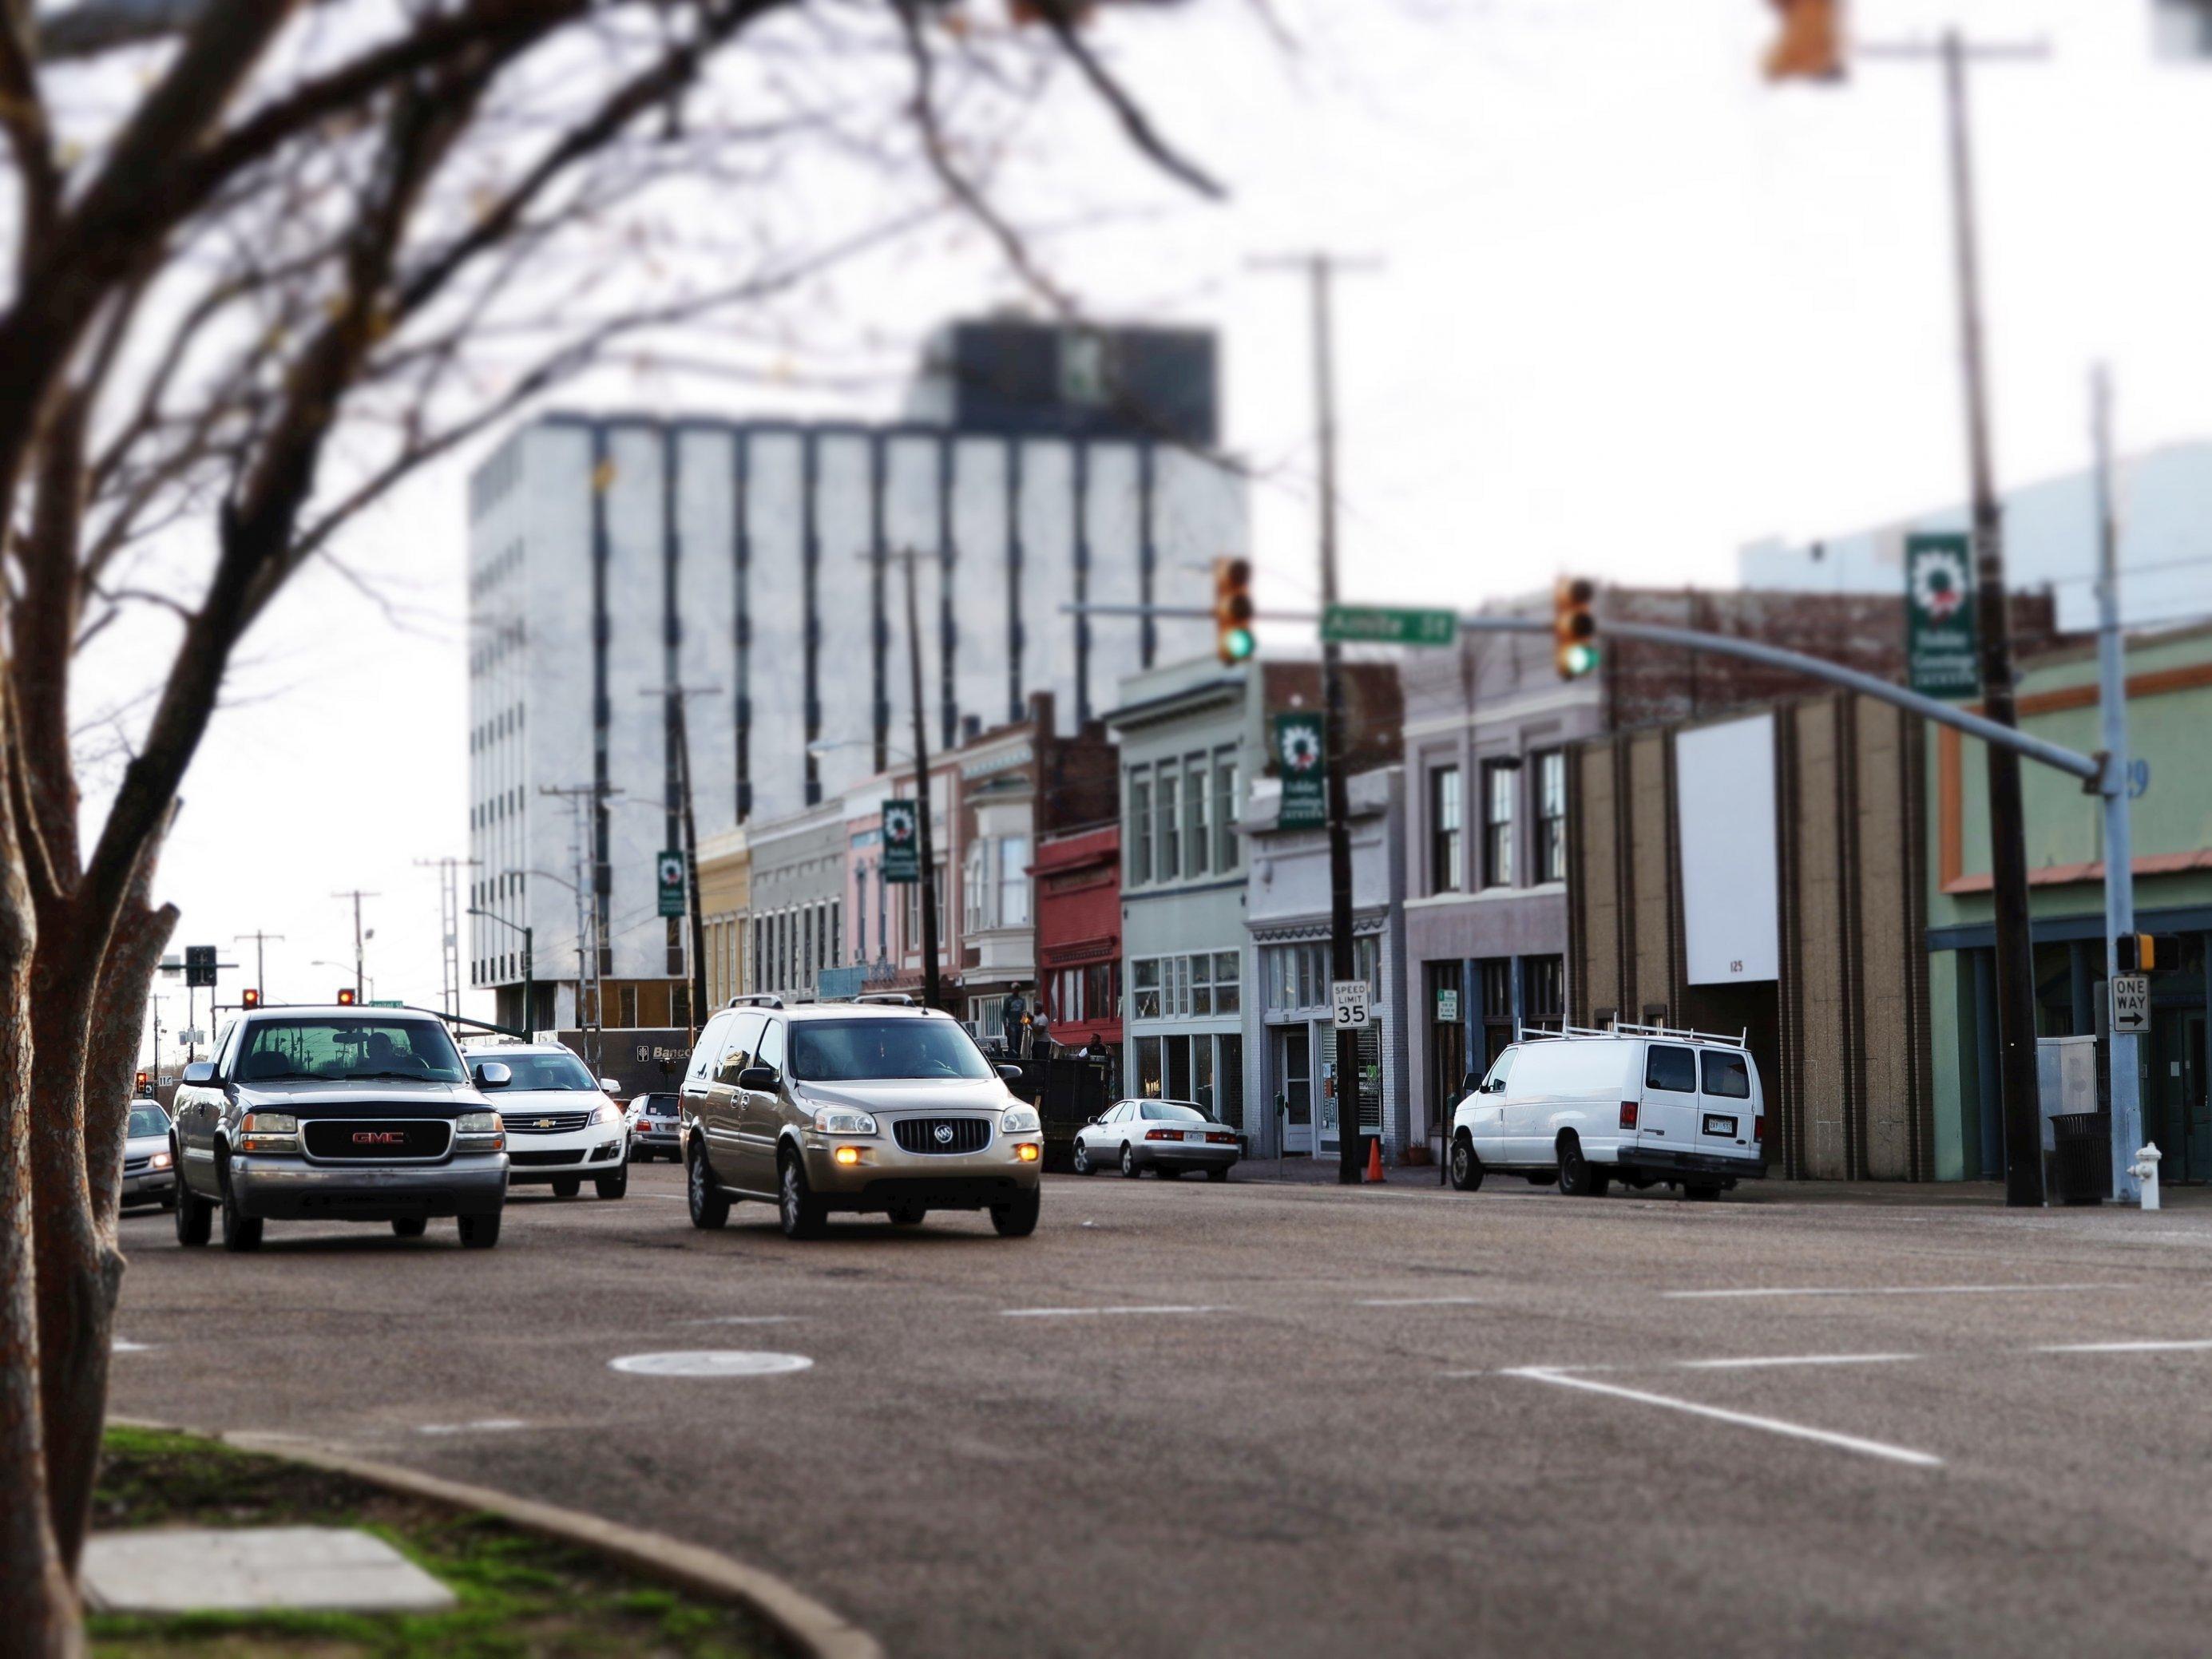 Straßenkreuzung in Jackson, Mississippi.